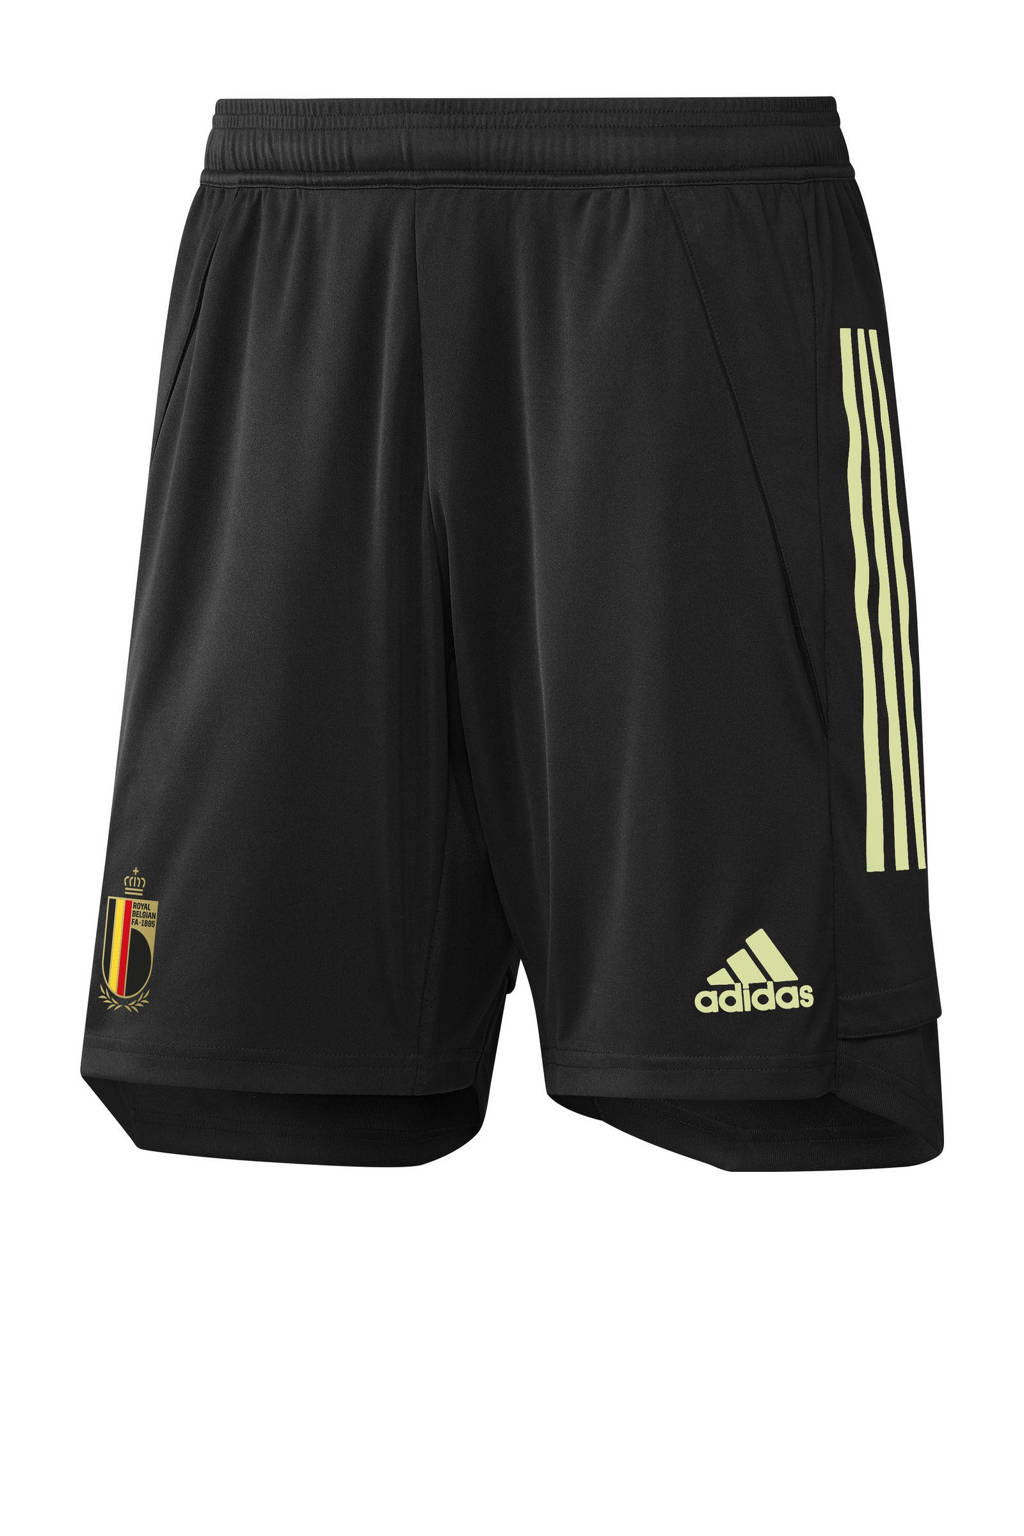 adidas Performance Senior België voetbalshort training zwart, Zwart